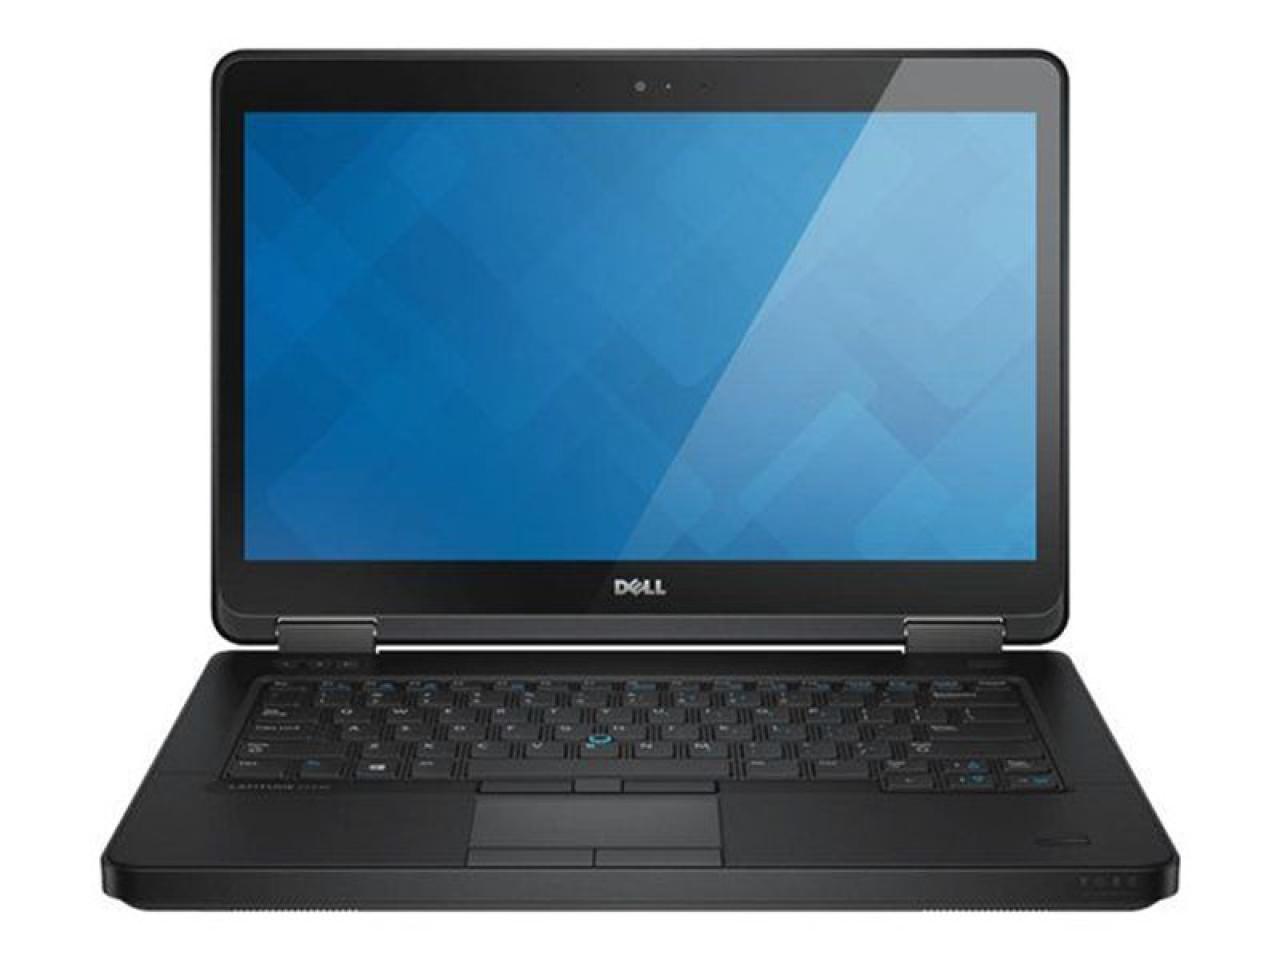 Dell Latitude E5440  - shop.bb-net.de